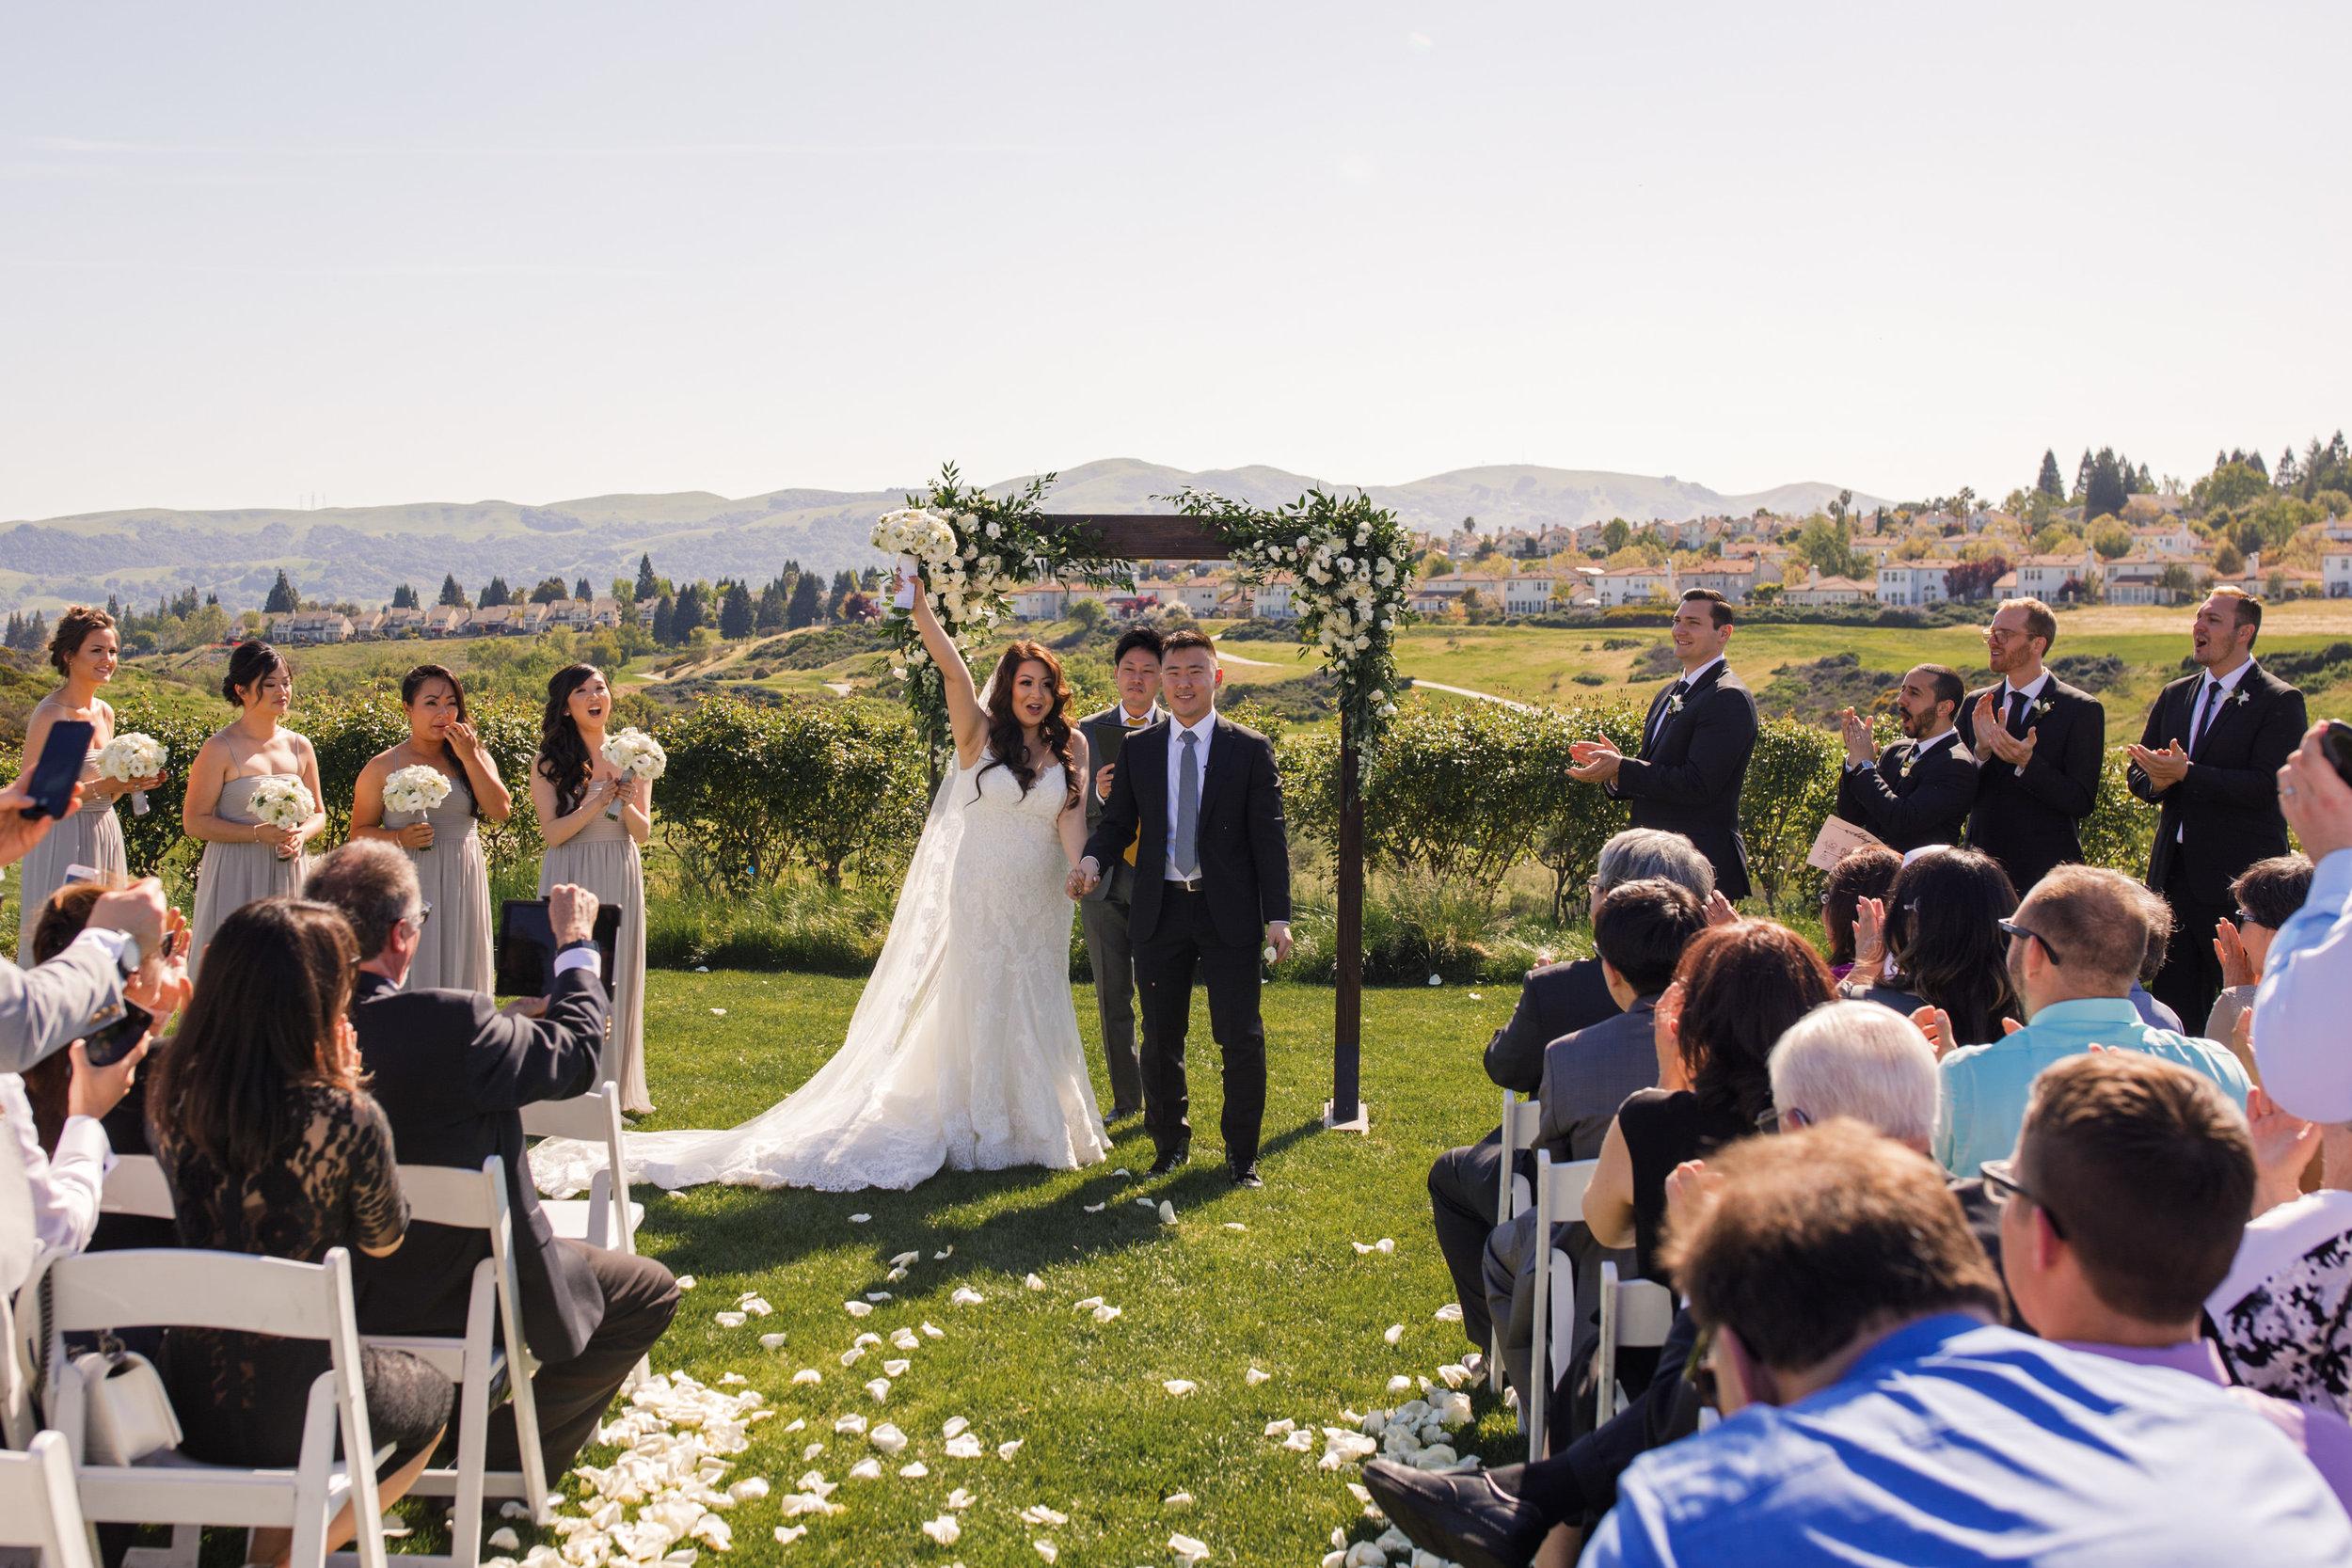 KimandBen_wedding-377.jpg